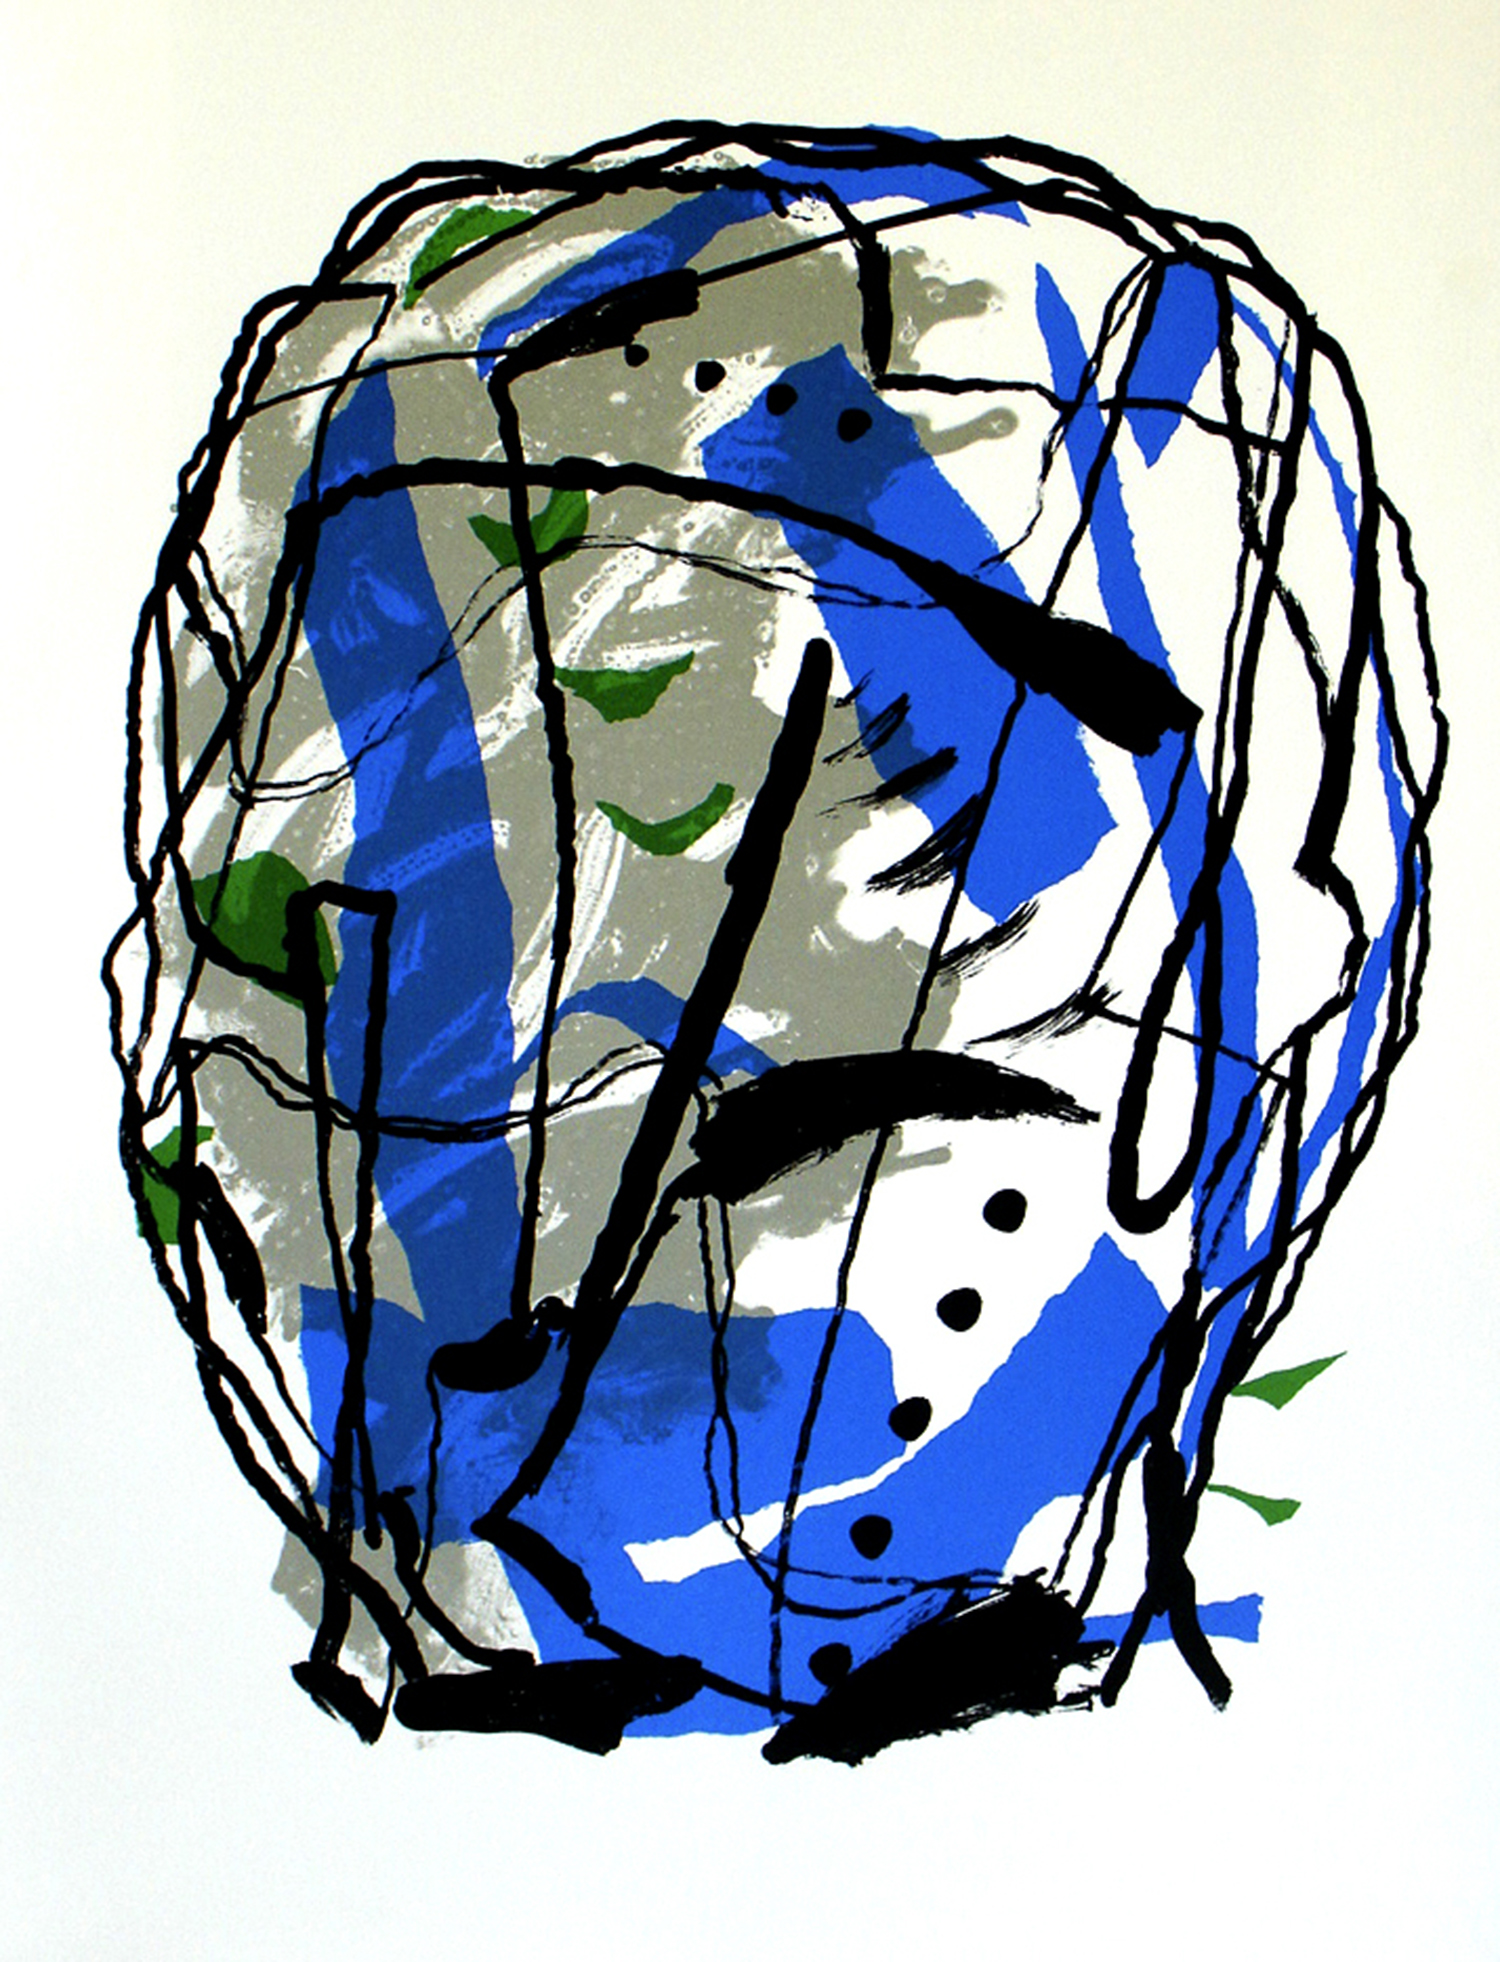 Peter Griffin, Big Head 2    Date:  2007   Size (cm - unframed):  99 x 75   Technique:  Screenprint   Materials:  Somerset Satin 300gsm   Publisher:  The Artist   Copyright:  The Artist    P.O.A.